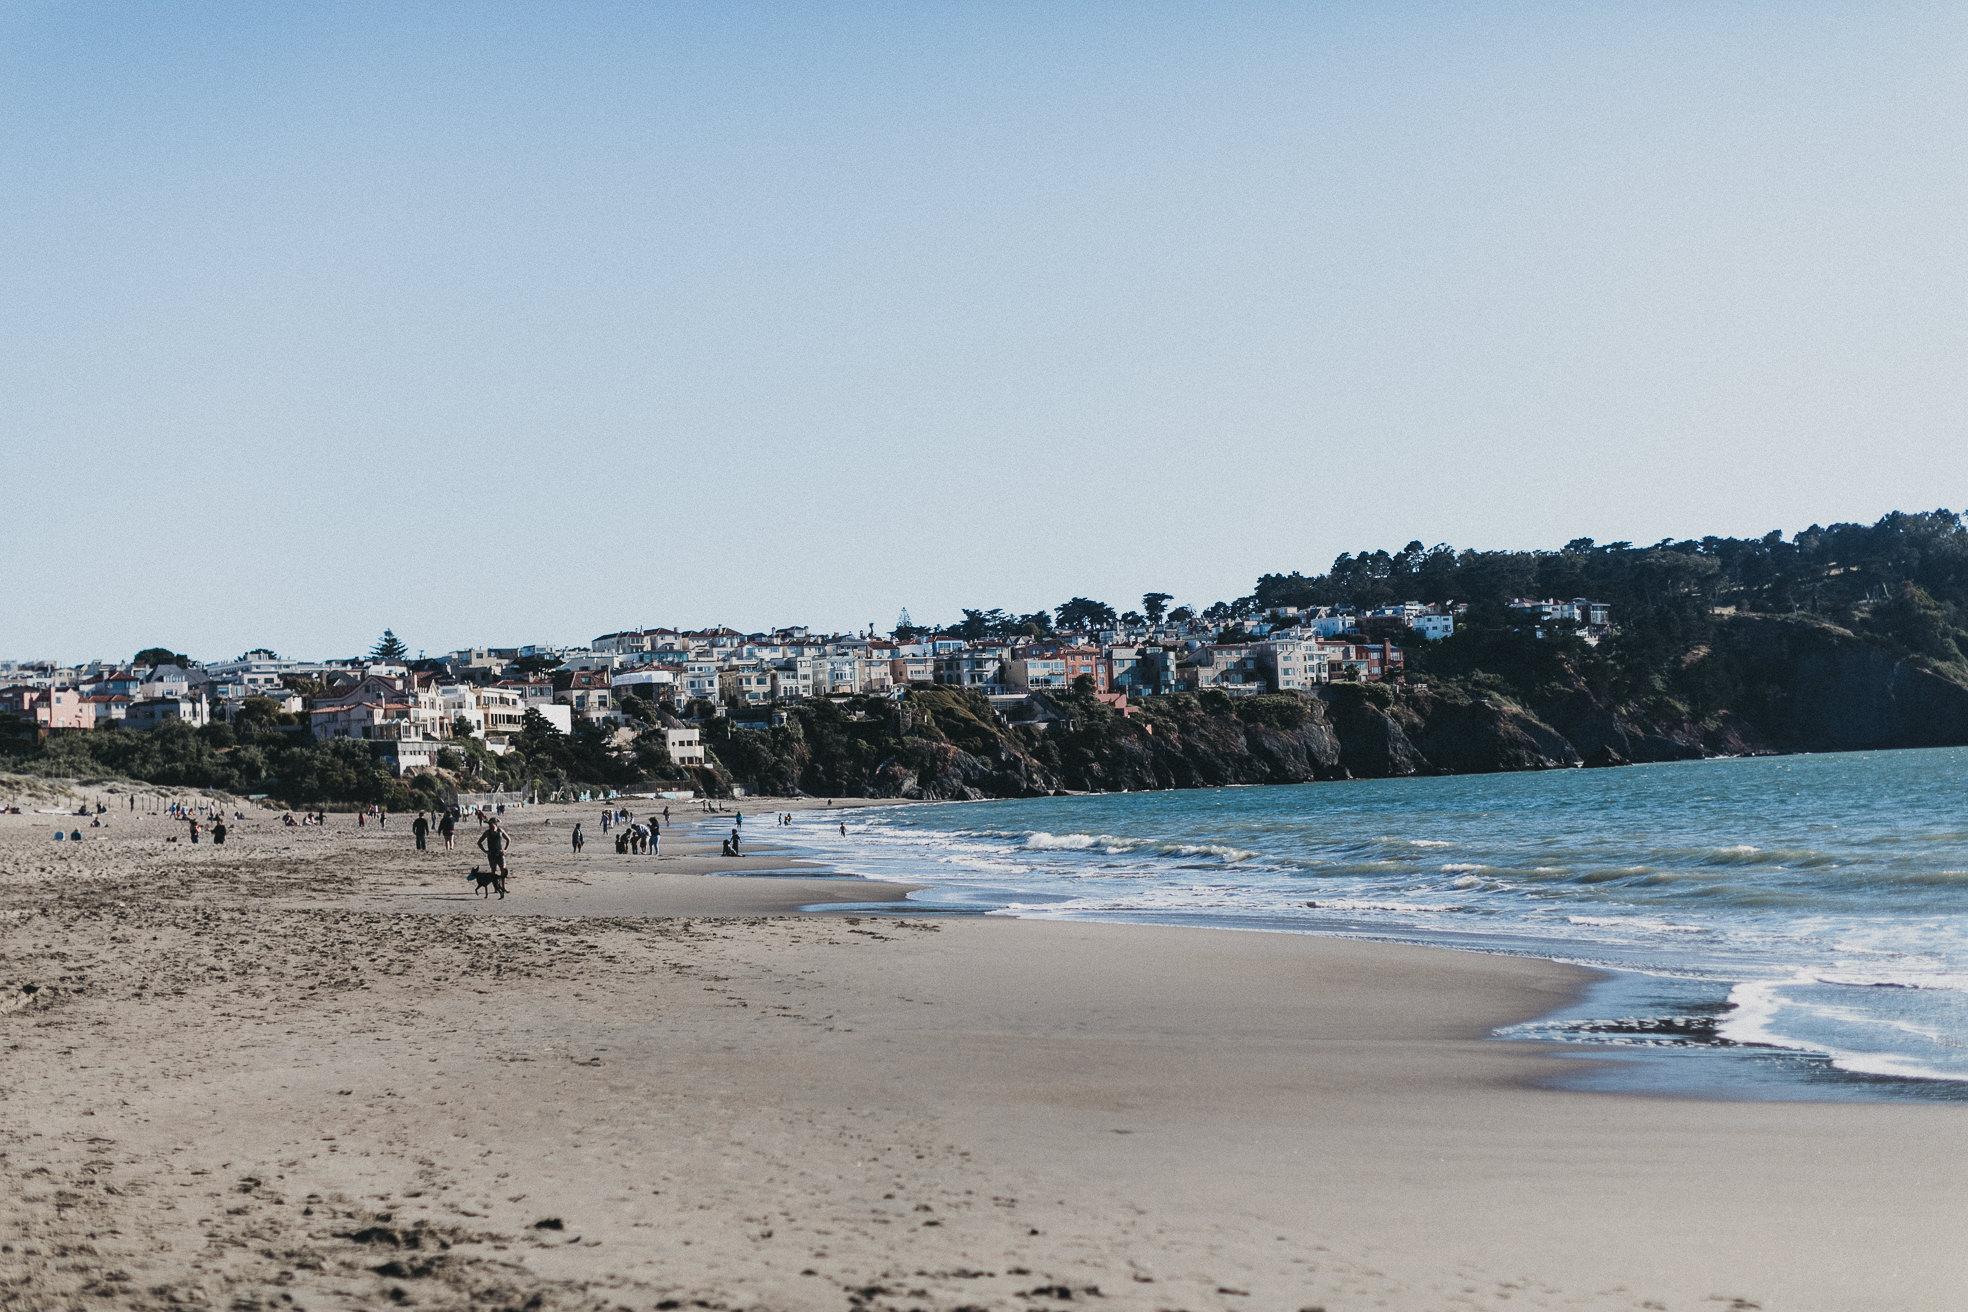 San-Francisco-BildervomLeben-5855